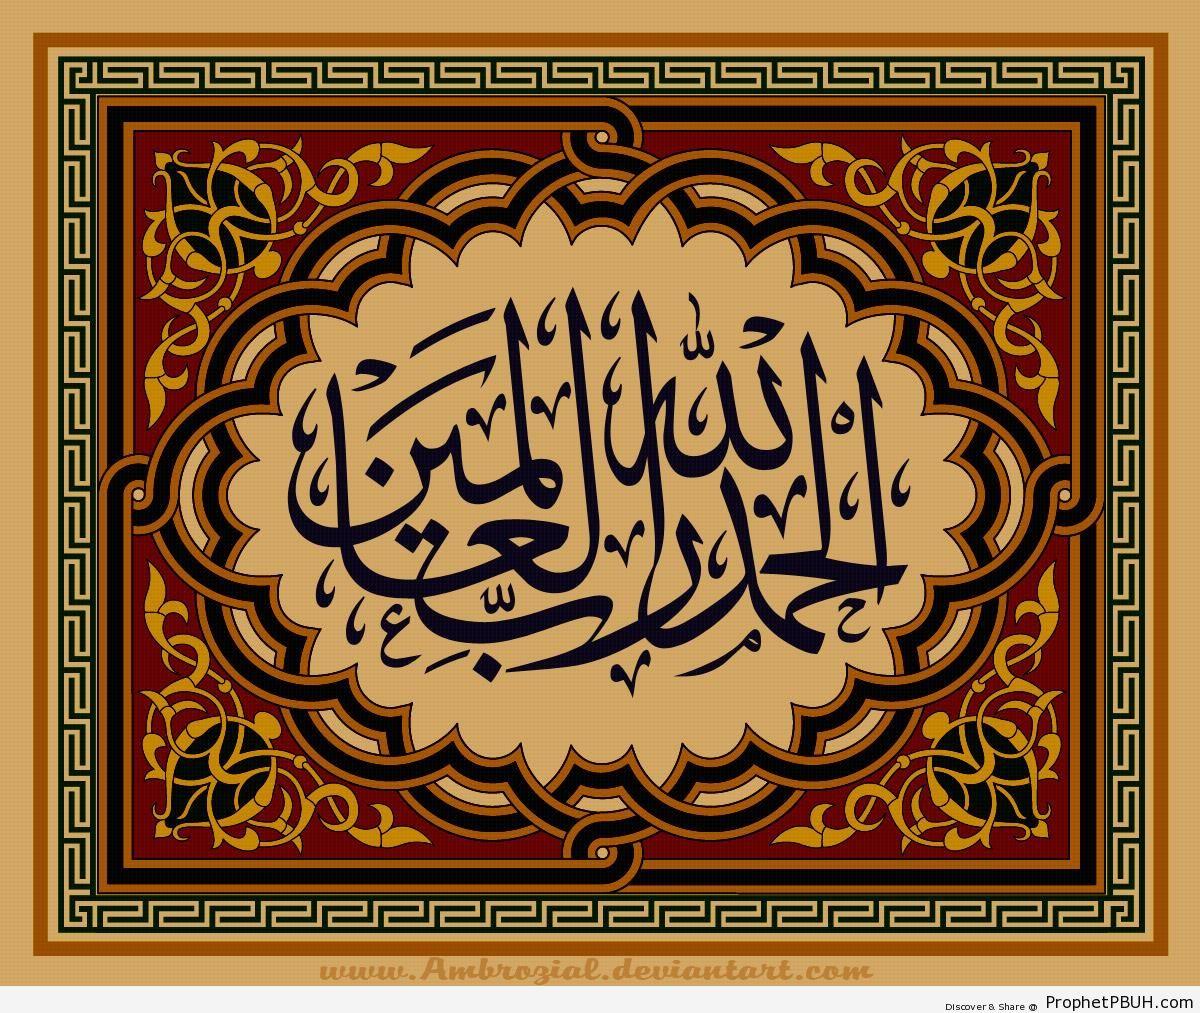 Alhamdulillahir Rabbil Alameen Calligraphy - Alhamdulillah Calligraphy and Typography -002